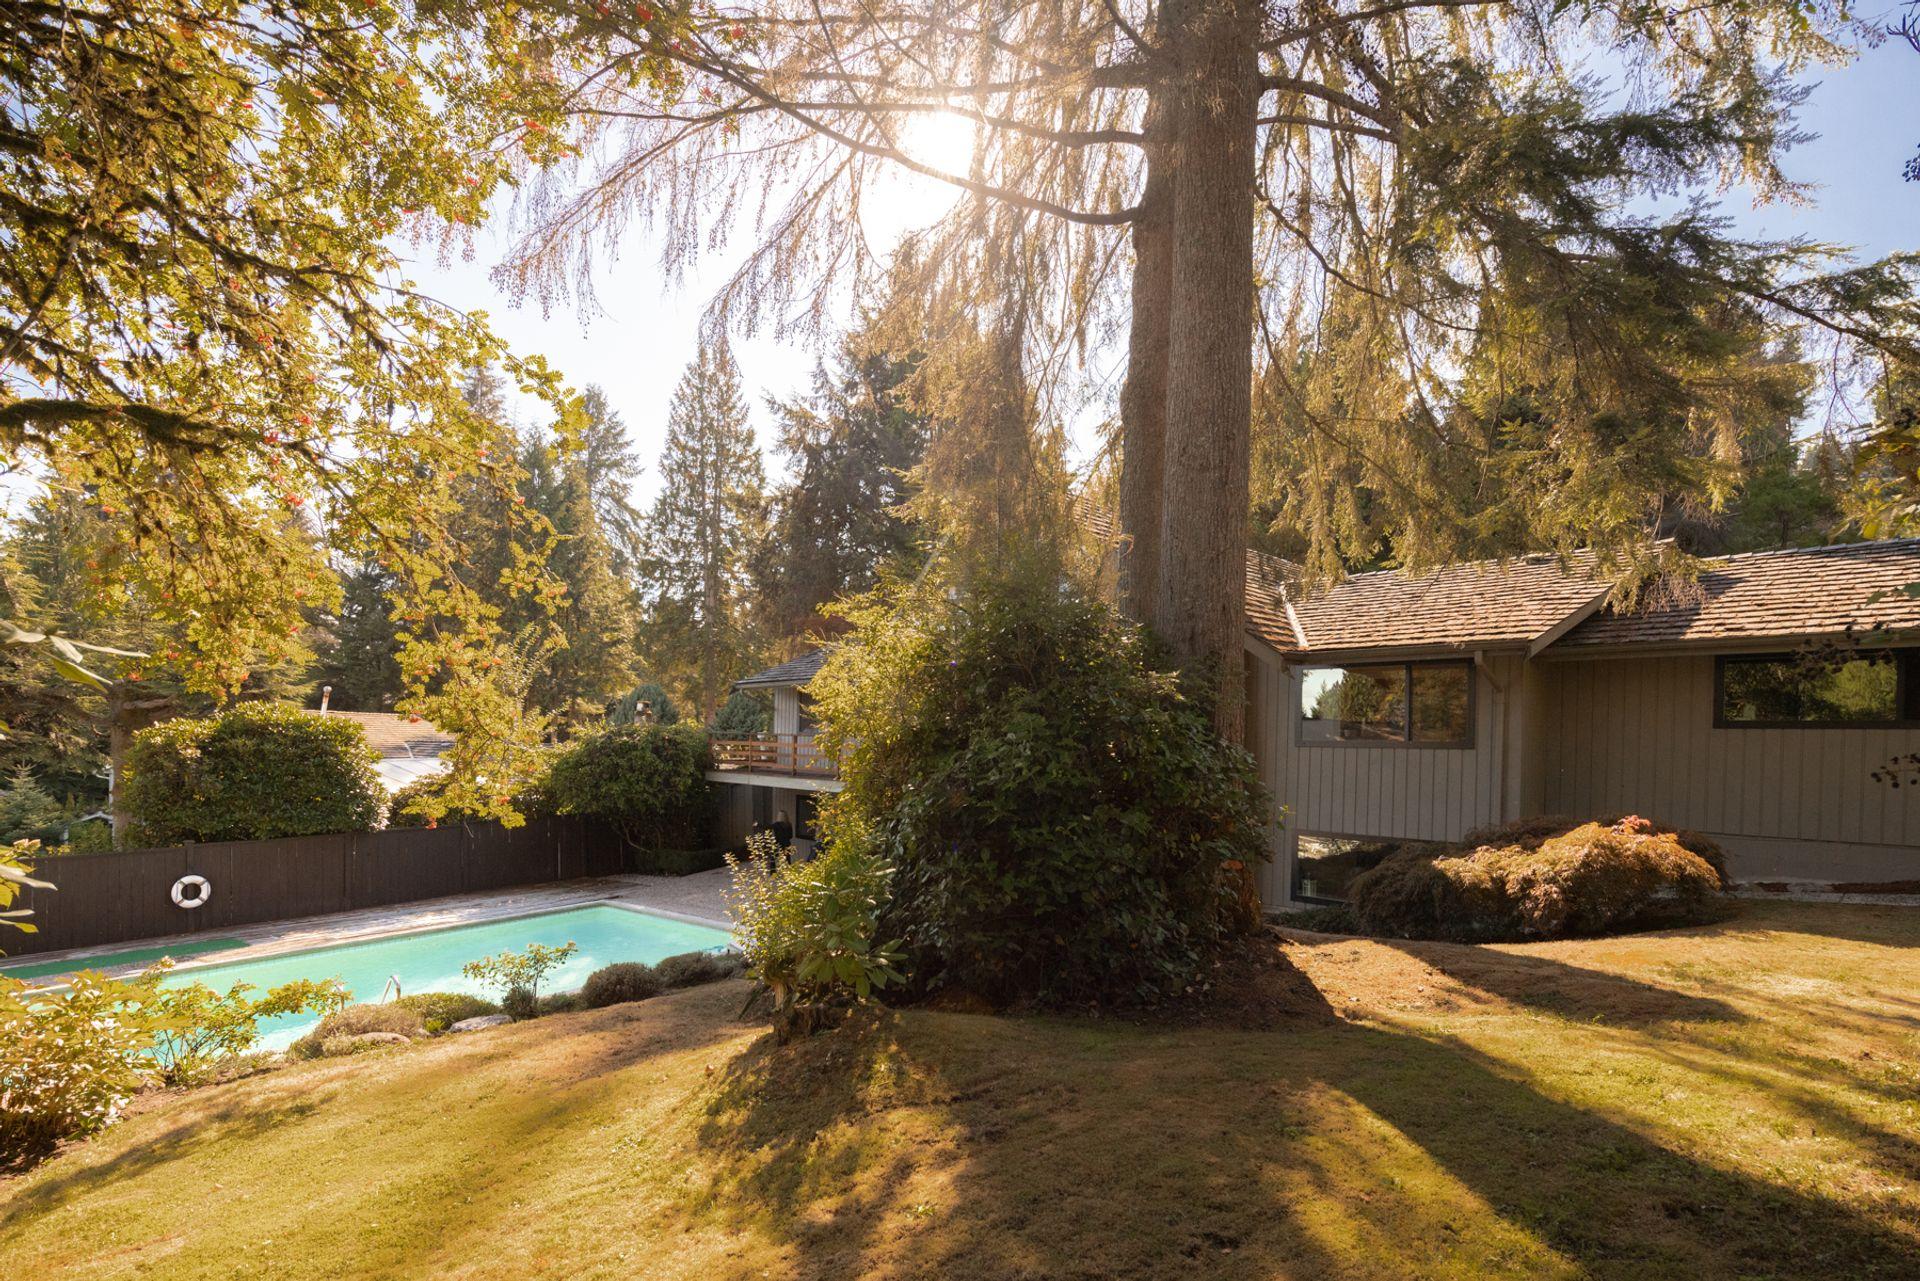 86 Stevens Drive, British Properties, West Vancouver - web-32